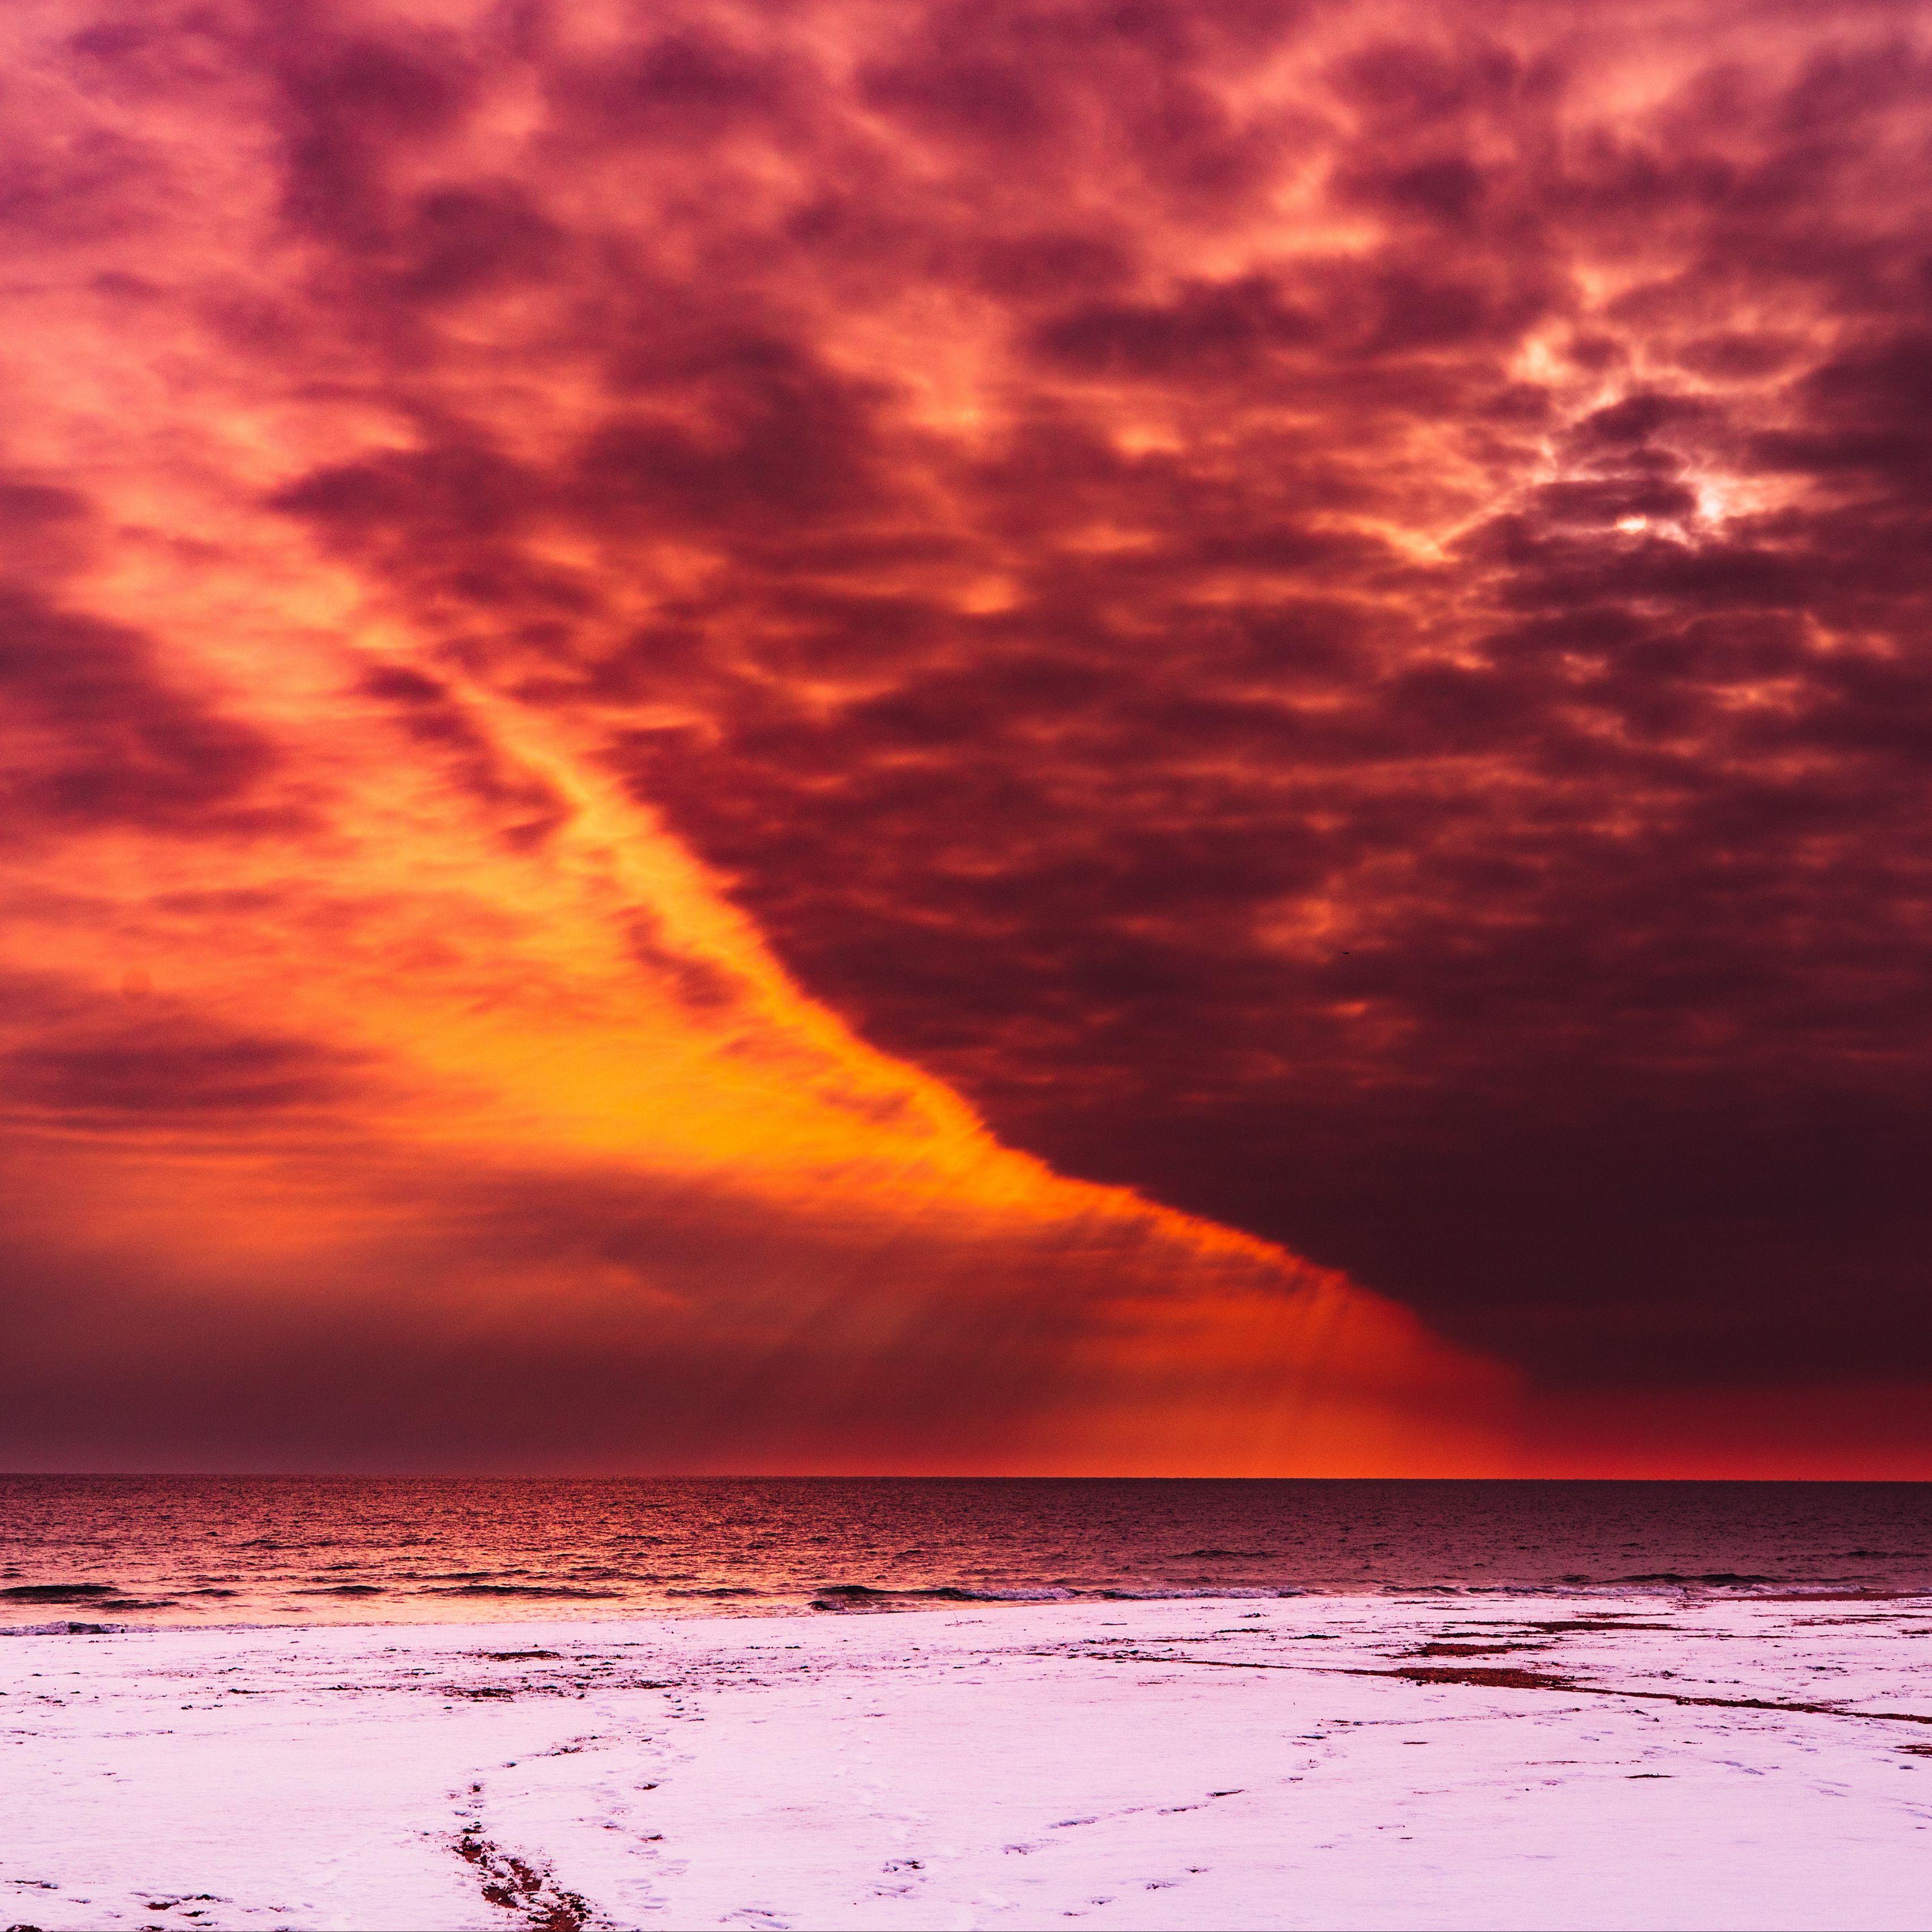 3415x3415 Wallpaper shore, radiance, sky, snow